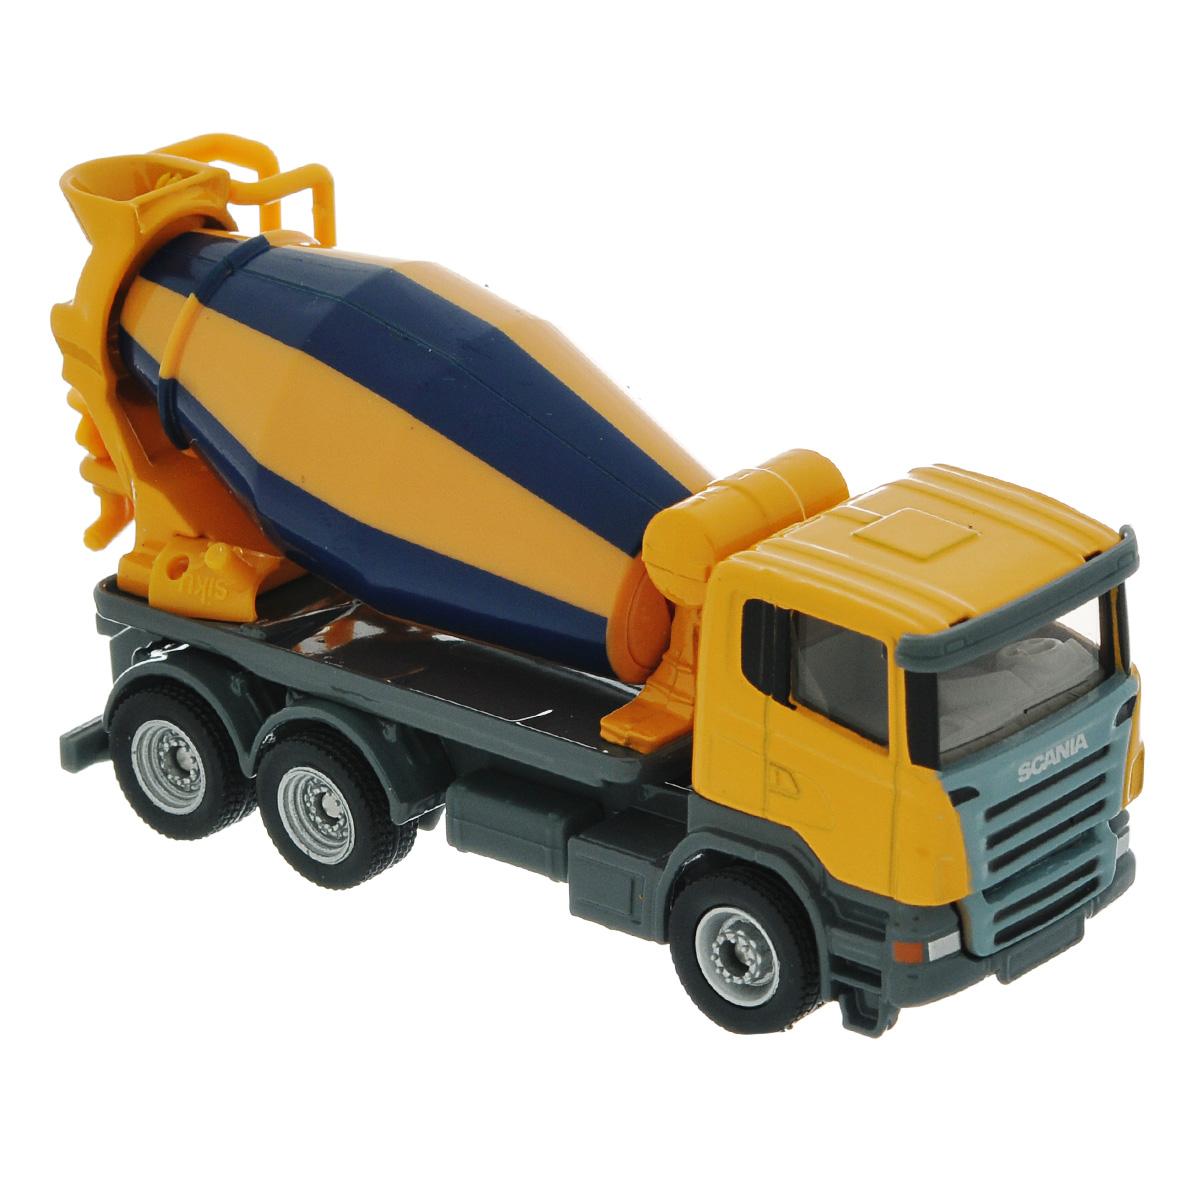 Siku Бетономешалка Scania модель машины chun base 1 43 scania